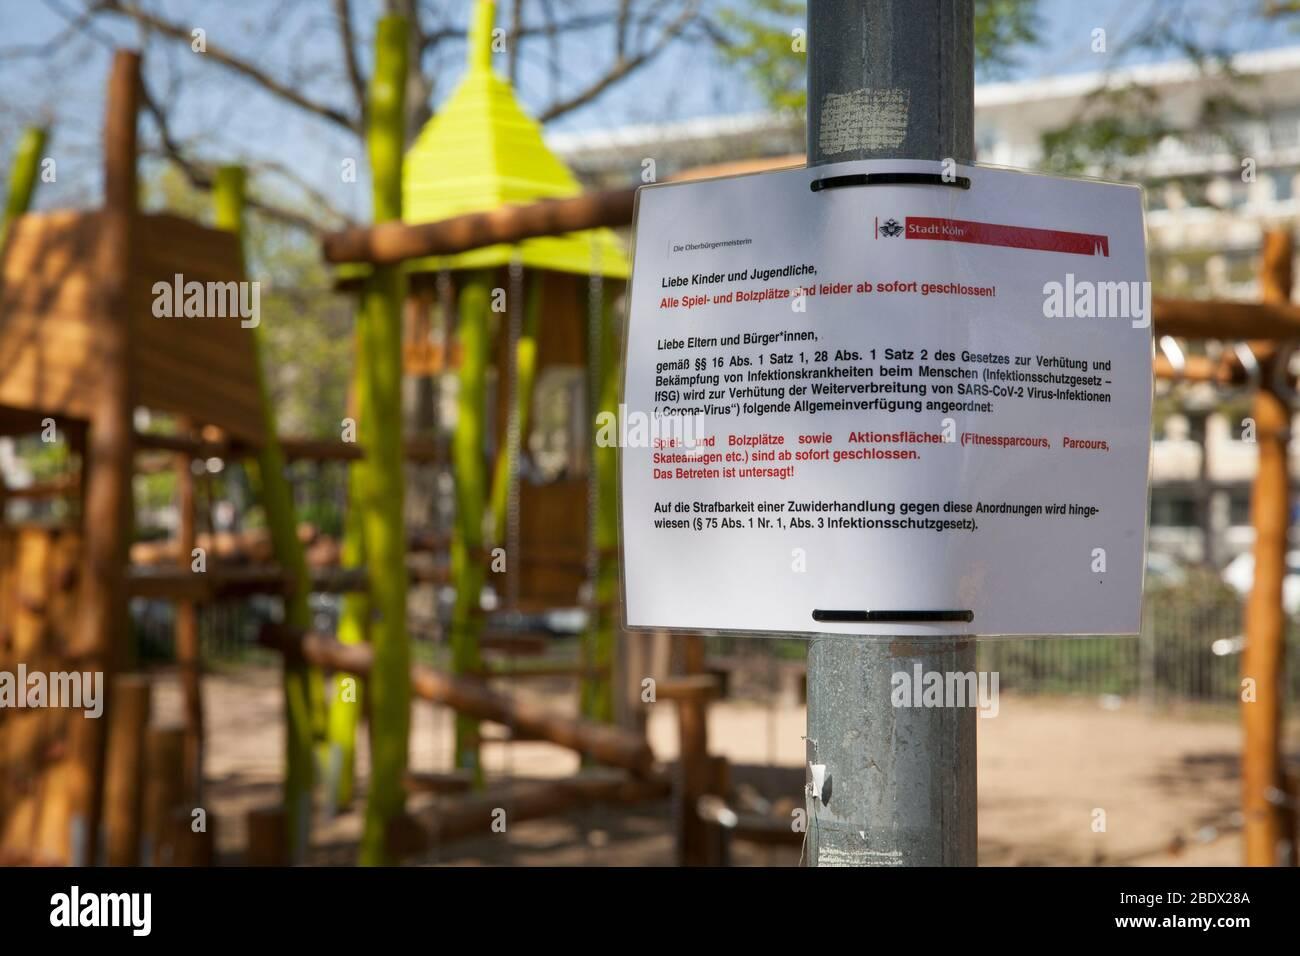 Coronavirus / Covid 19 outbreak, April 8th. 2020. Closed children's playground at the street Theodor-Heuss-Ring, Cologne, Germany  Coronavirus / Covid Stock Photo